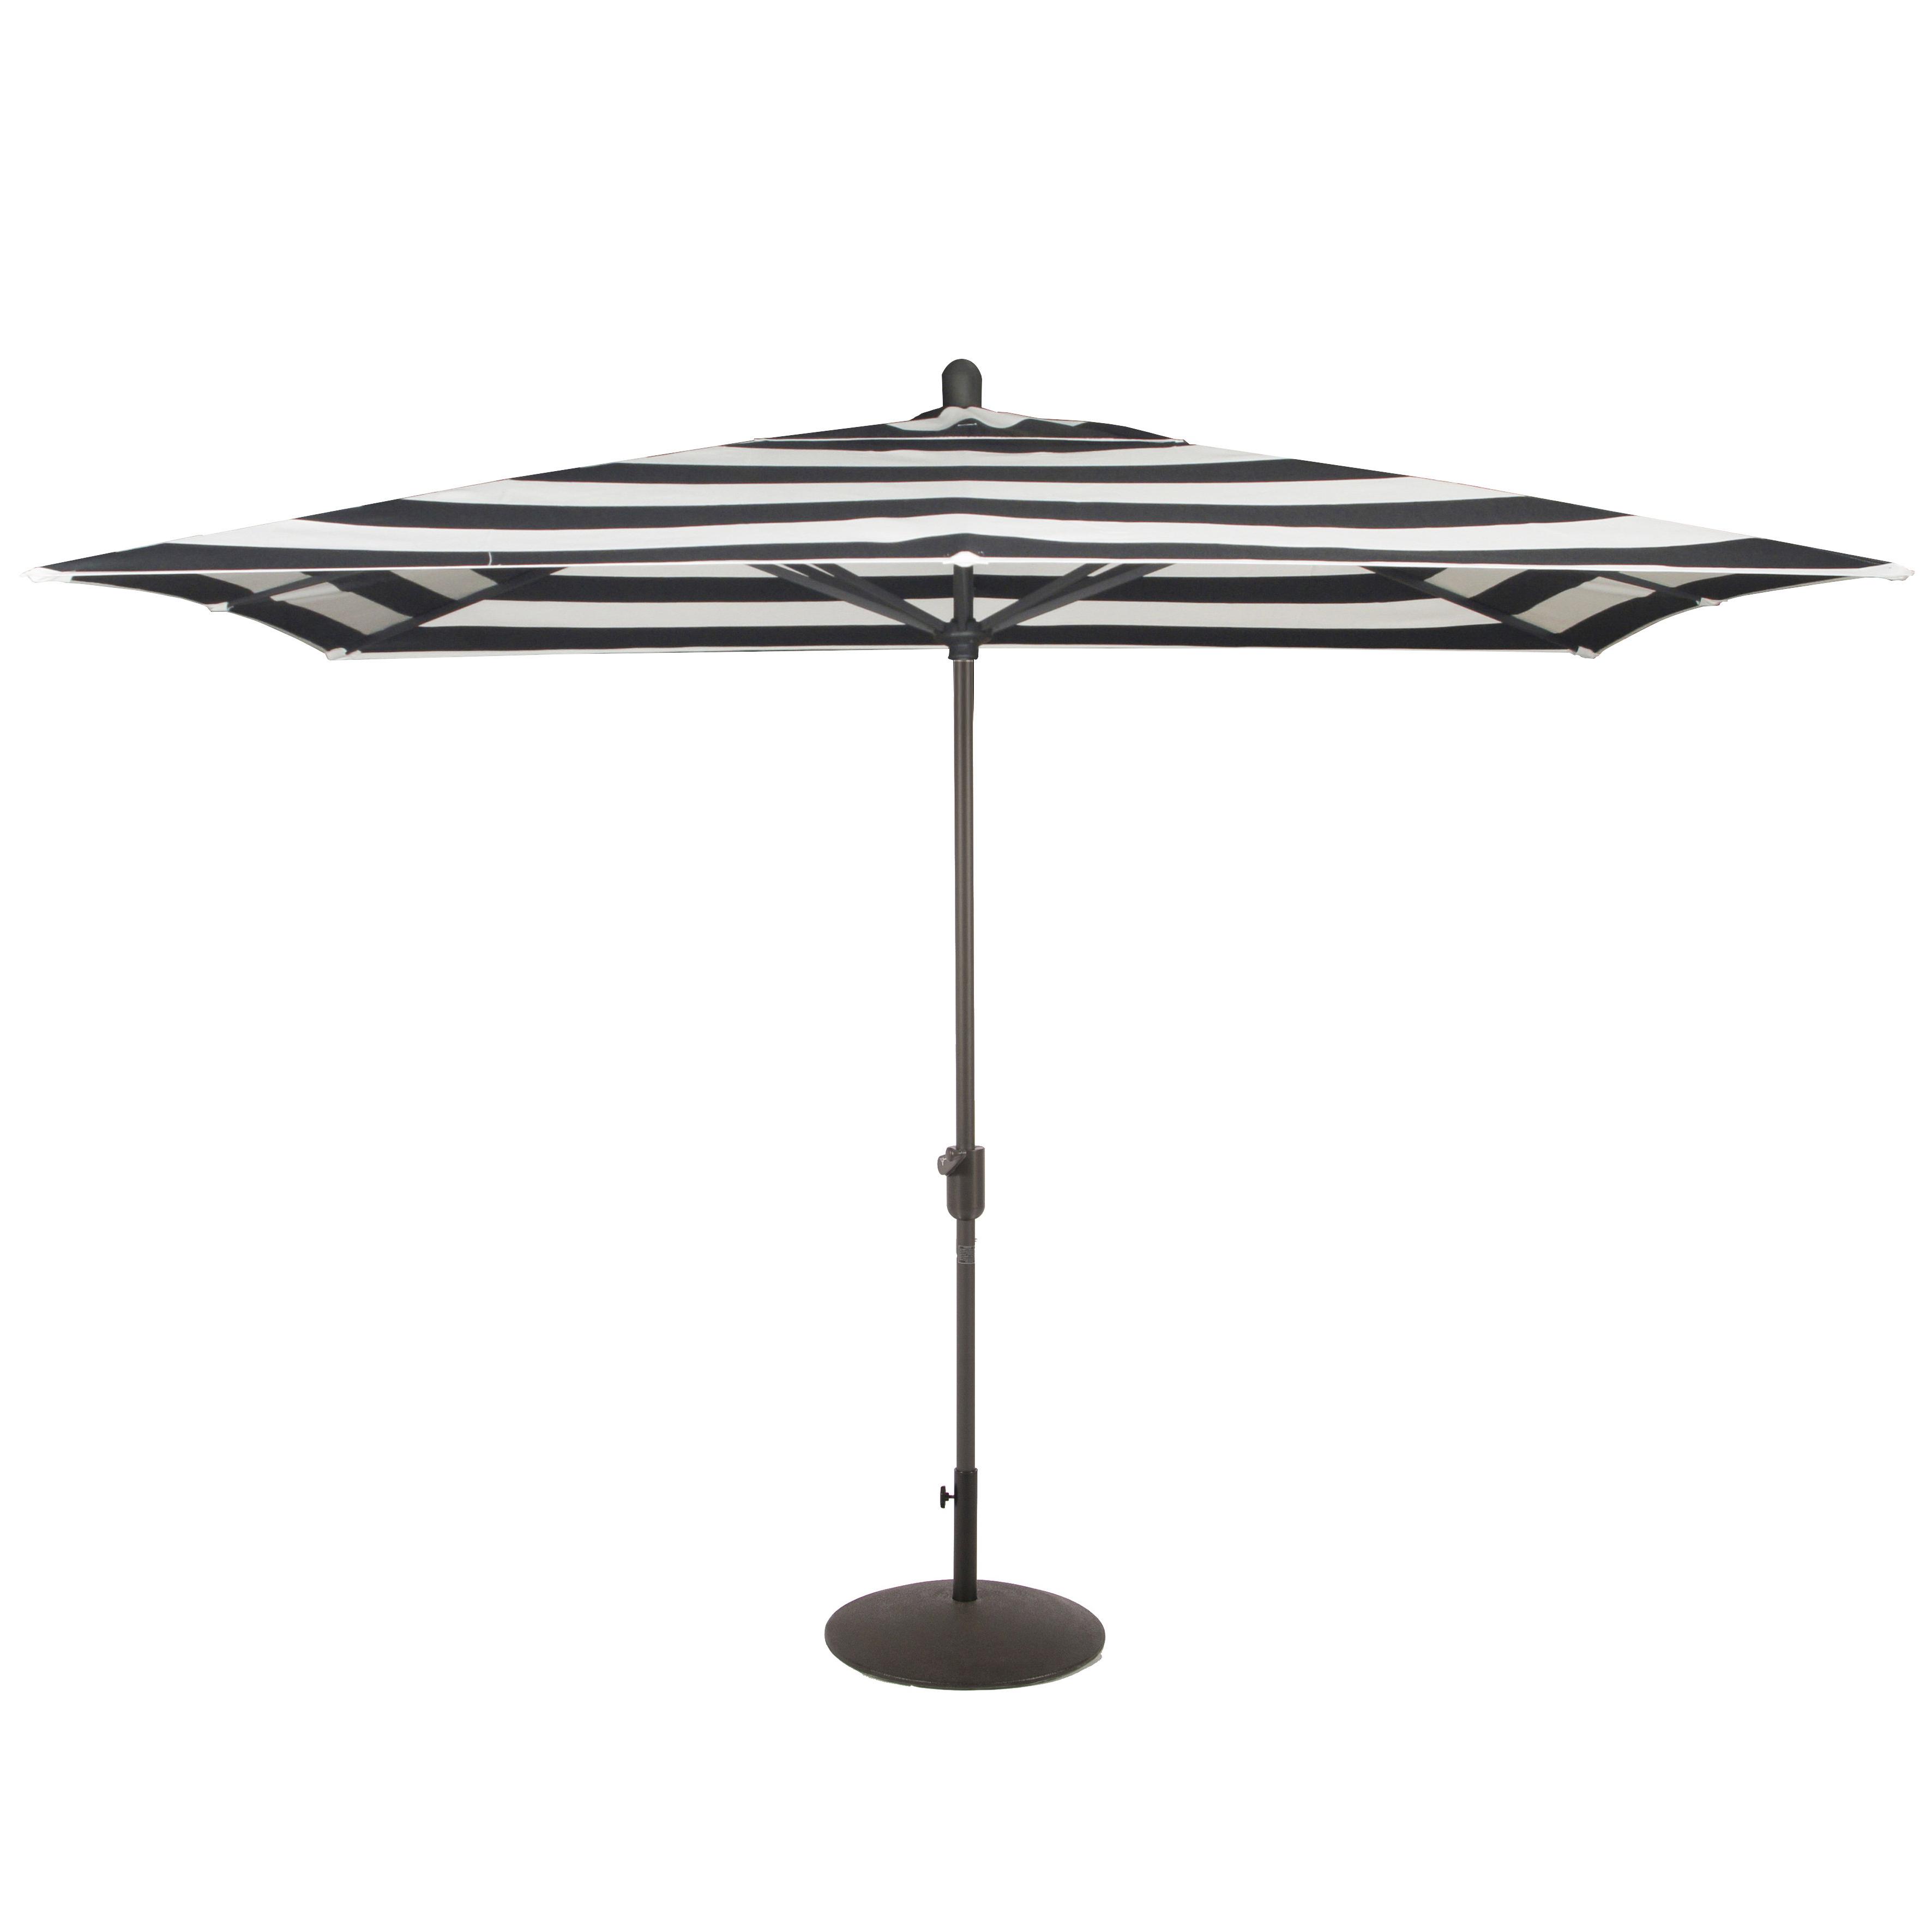 Northfleet Rectangular Market Umbrellas For Best And Newest Wieczorek Auto Tilt 10' X  (View 8 of 20)